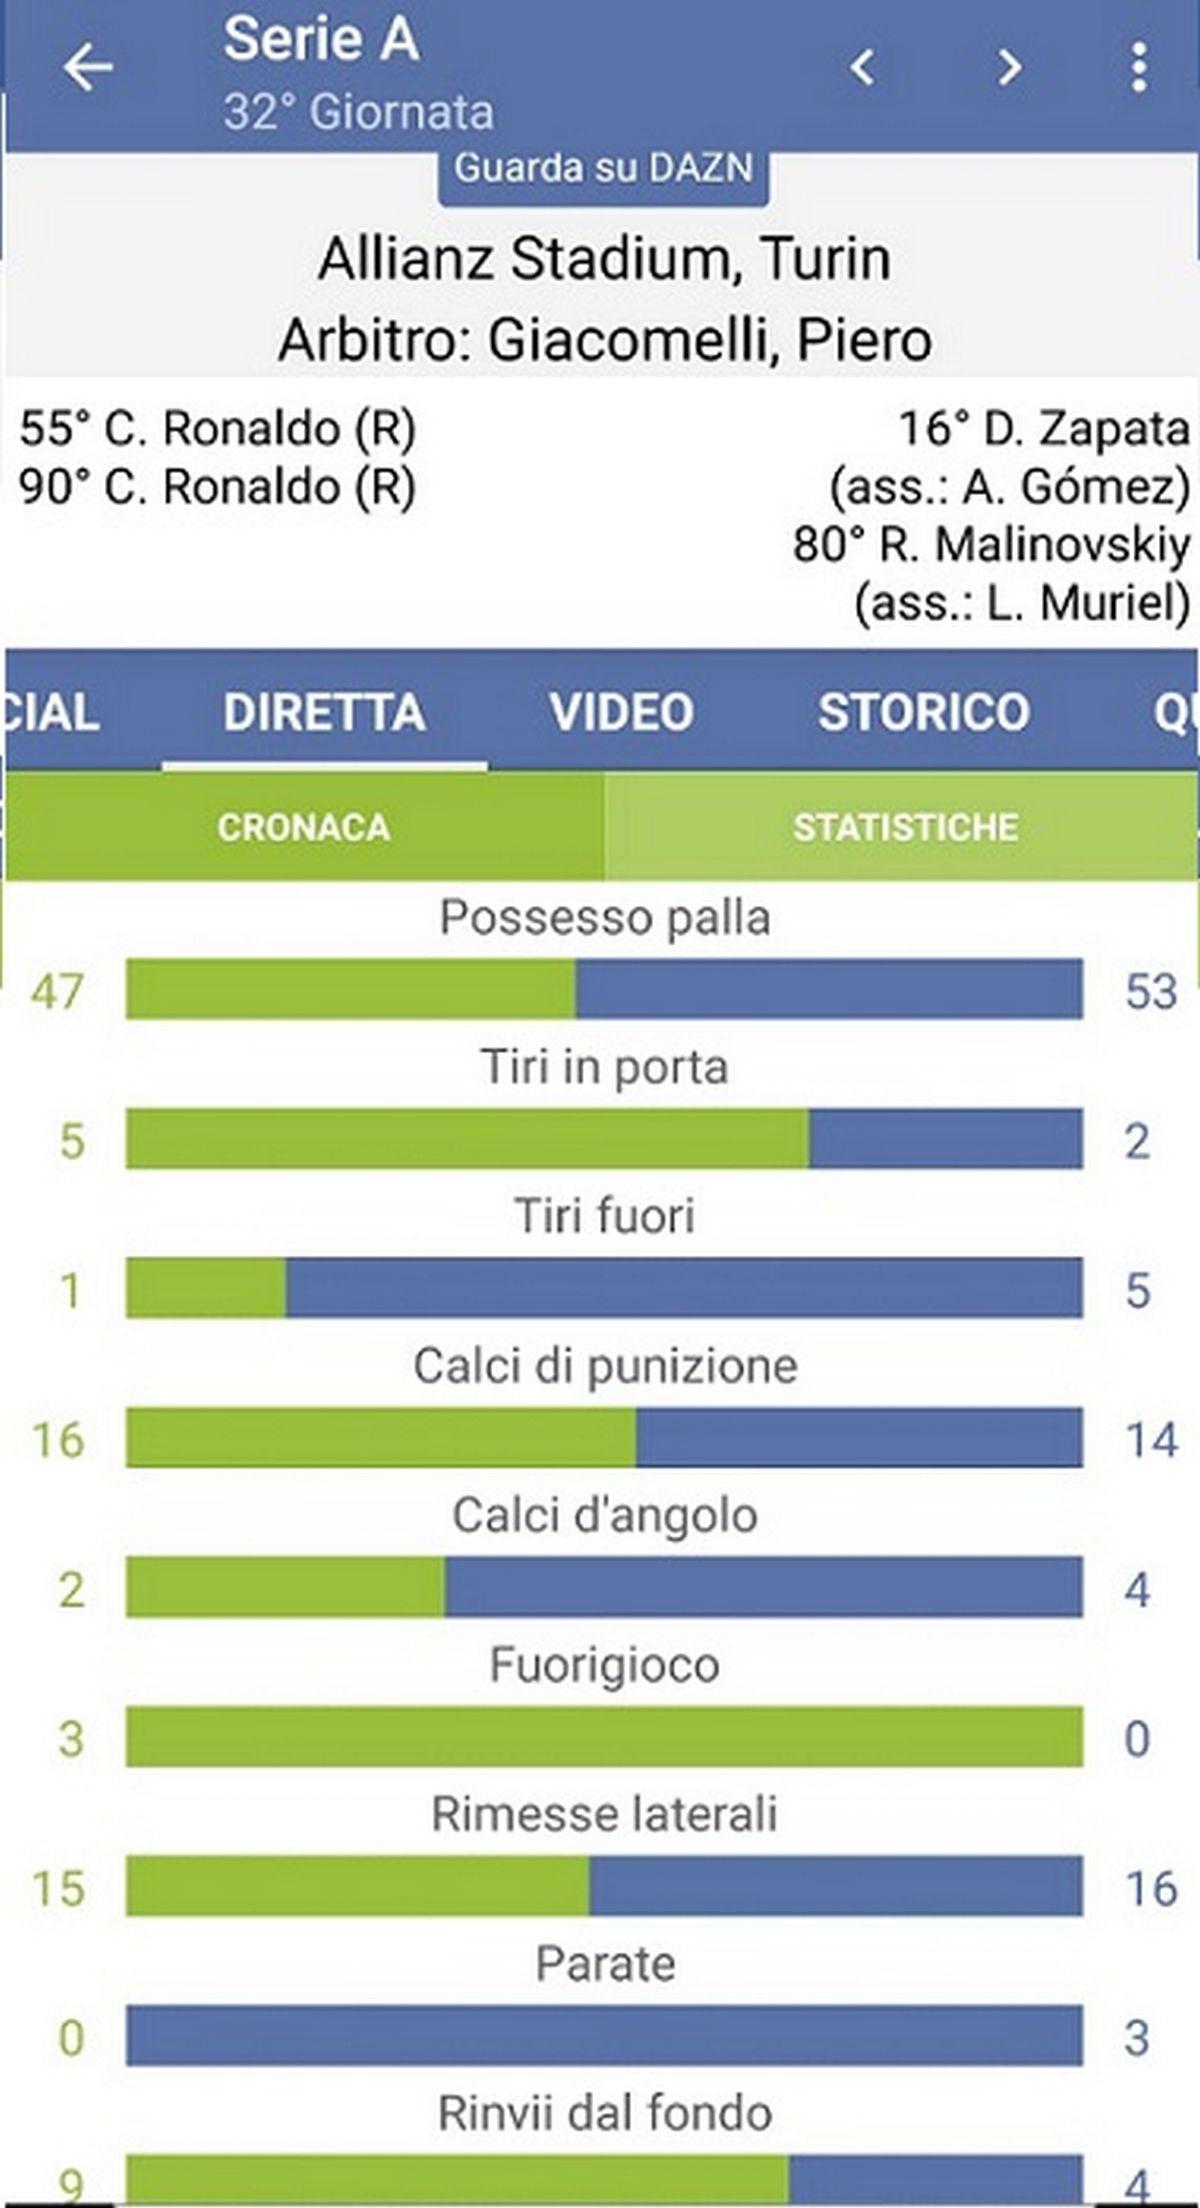 statistiche juventus atalanta 2-2